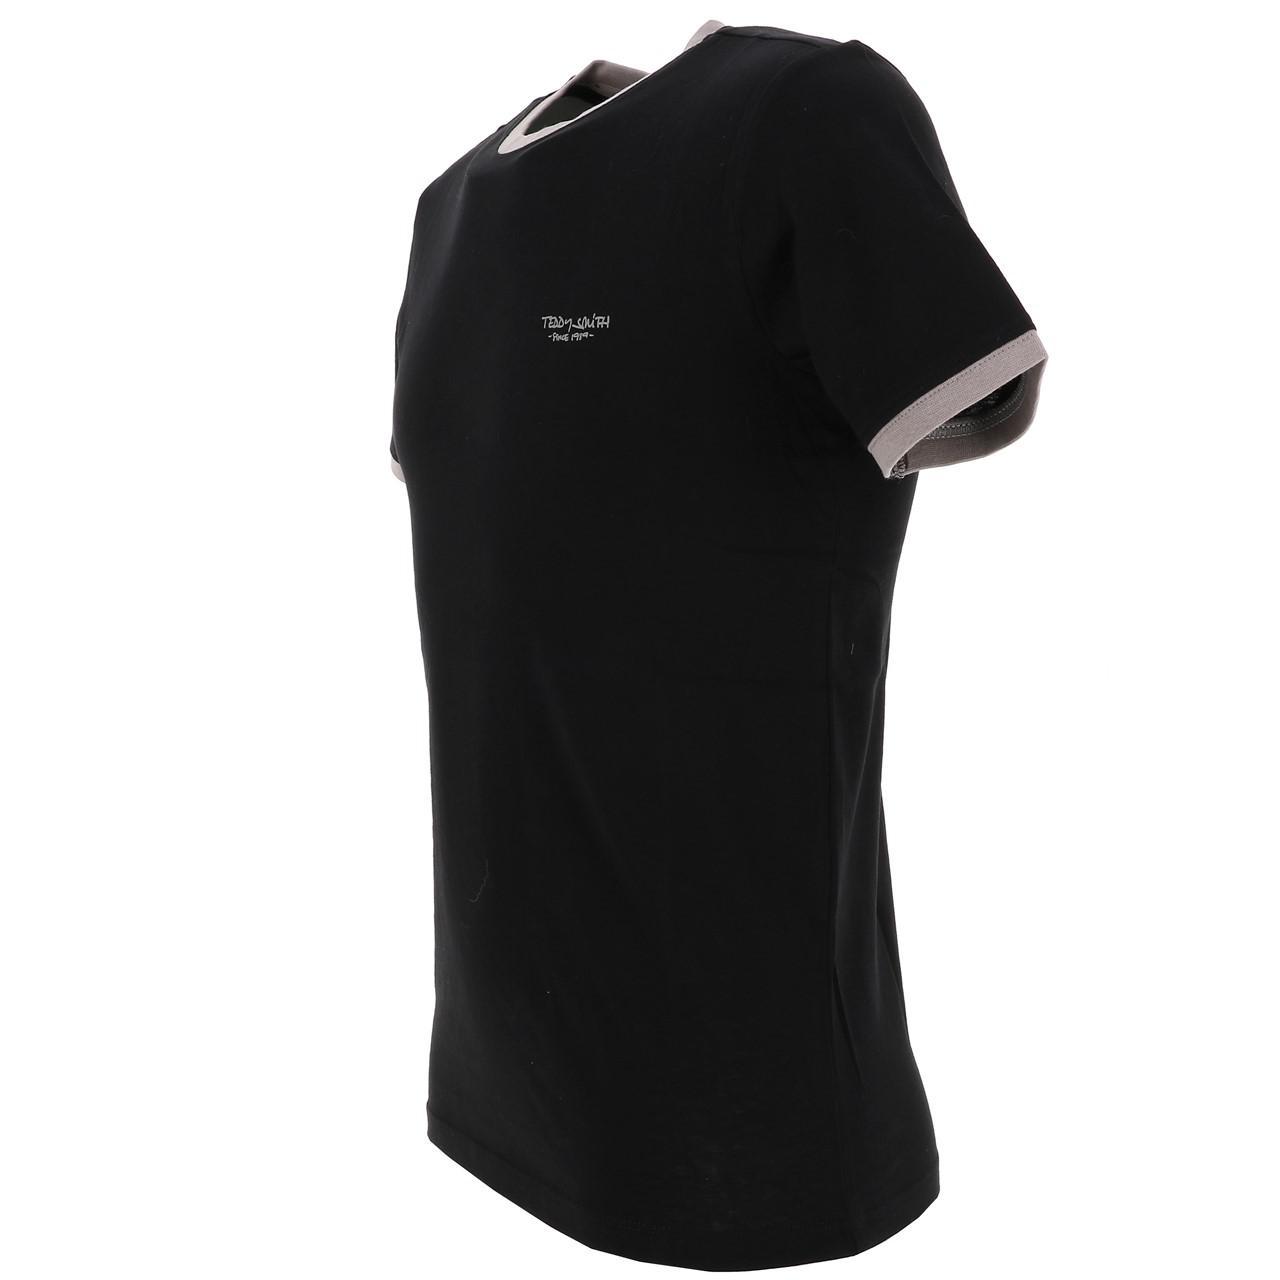 Short-Sleeve-T-Shirt-Teddy-Smith-the-Tee-Mc-Black-Black-65767-New thumbnail 4